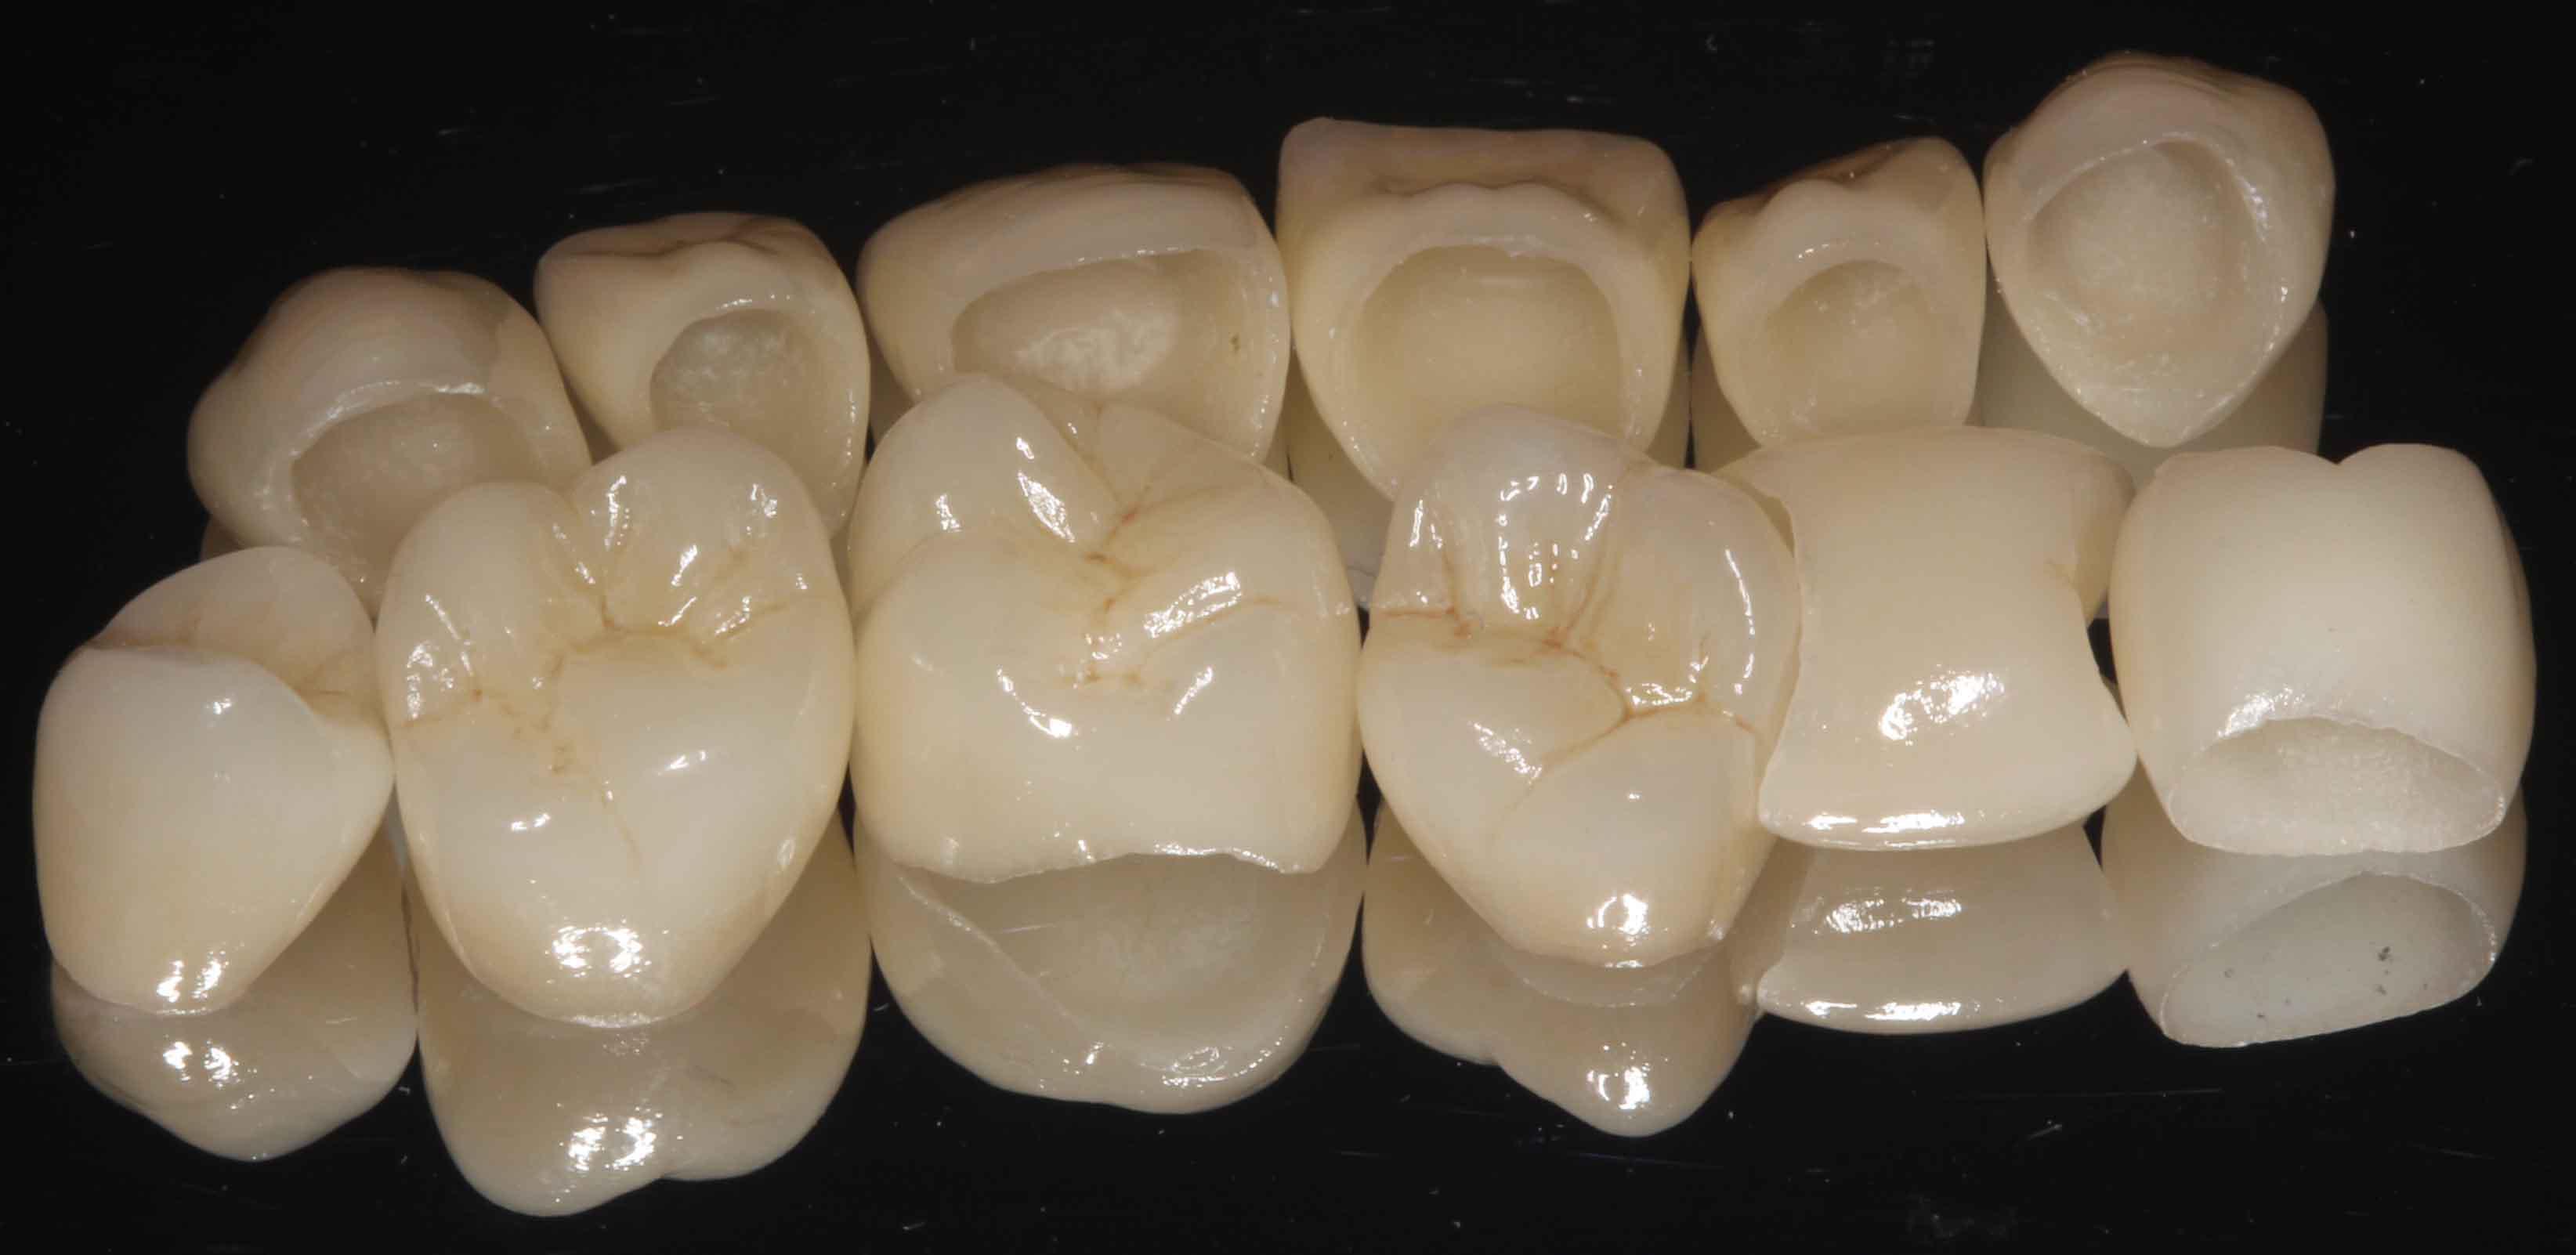 Est tica dental en a coru a cl nica dental pardi as for Marcas de vajillas de porcelana